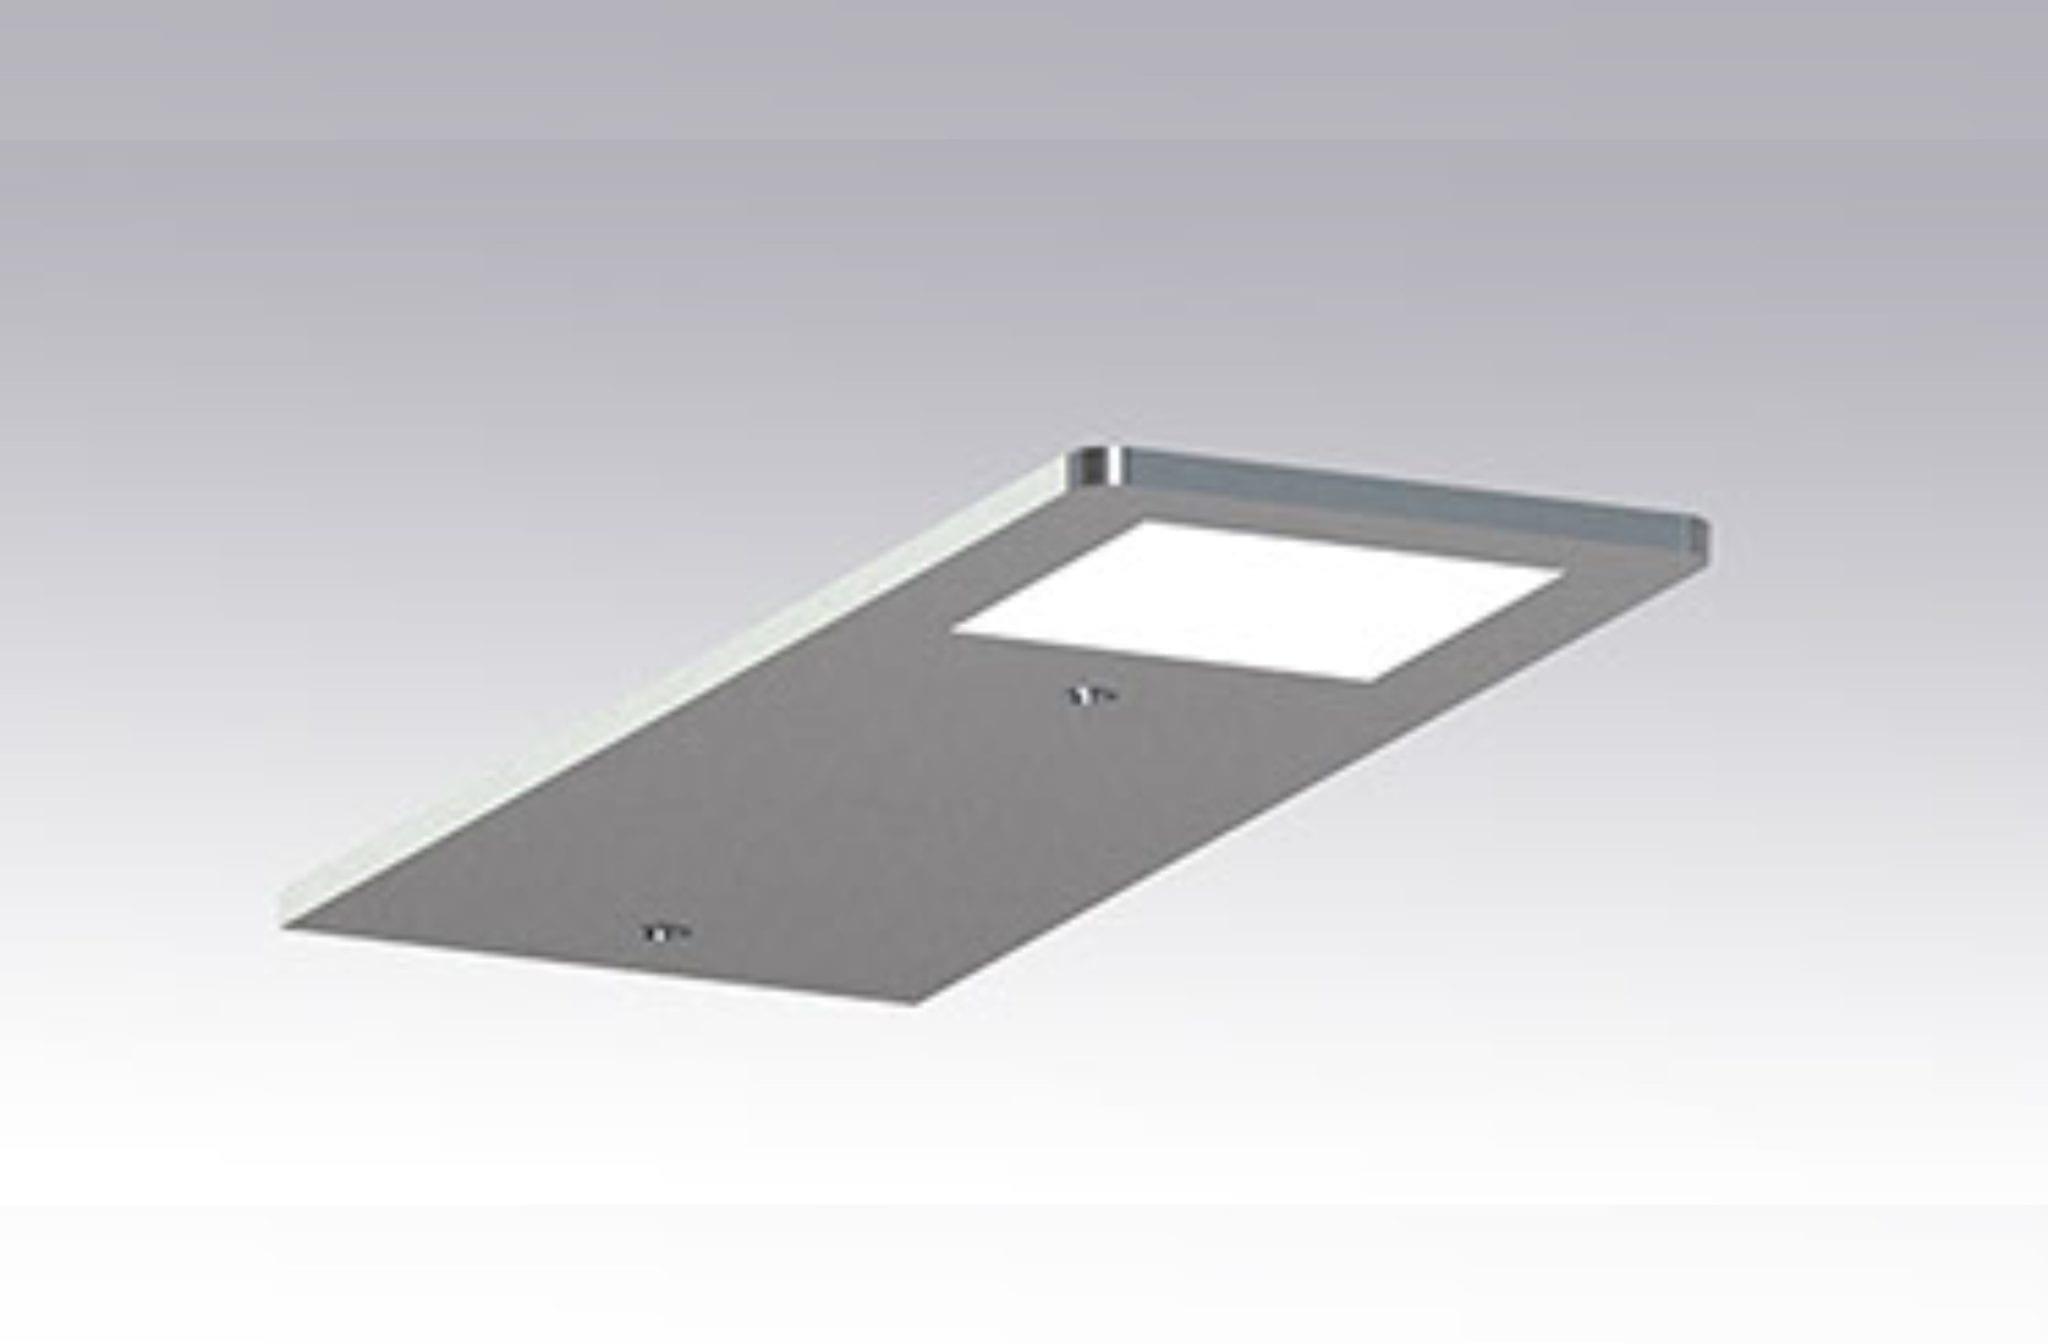 2 stk Flat LED Light møbelspot og driver   Illuminor as